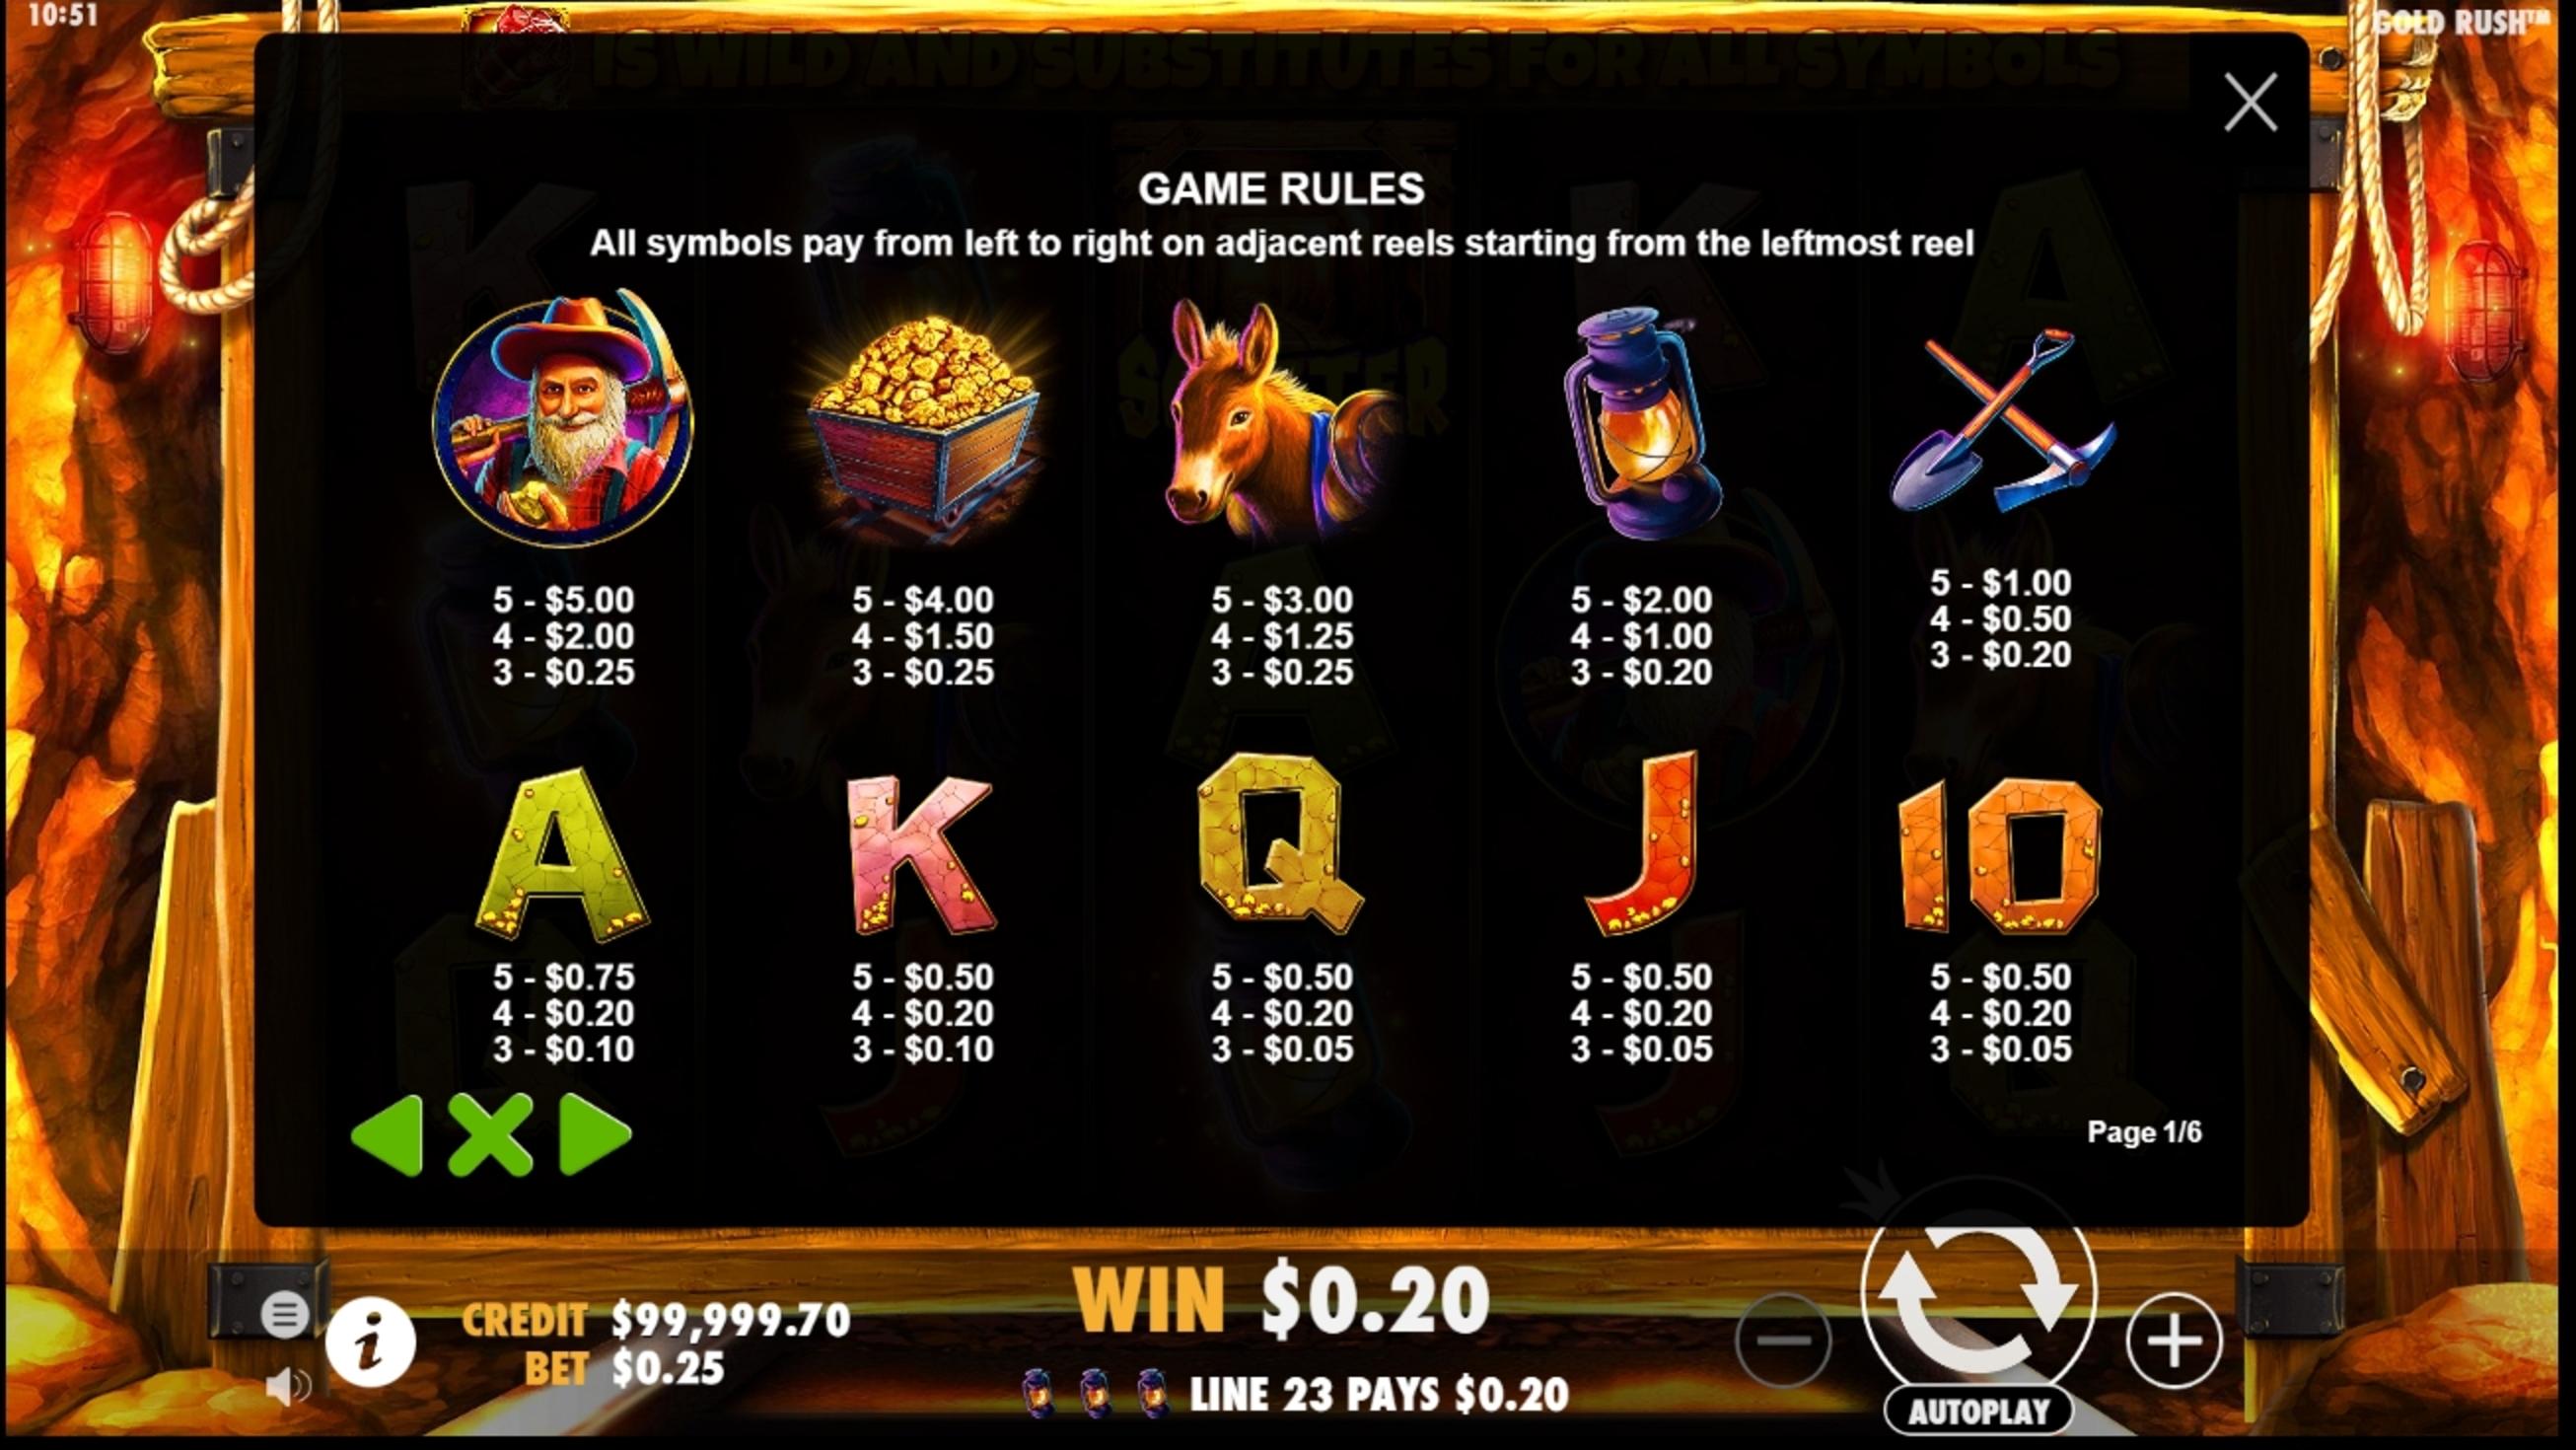 All slots $5 free